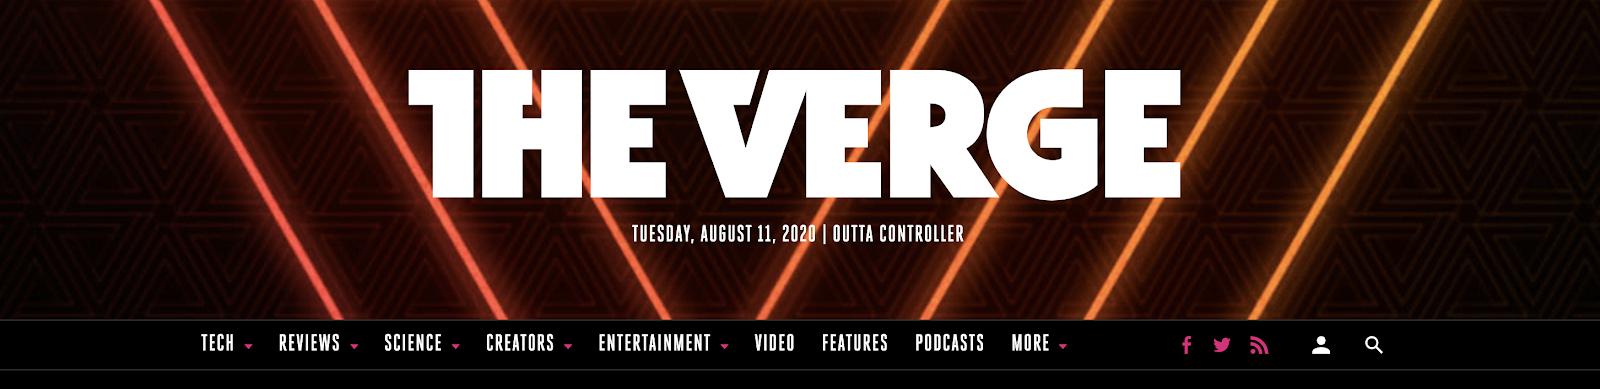 The Verge Homepage Screenshot (Blog Branding Example)